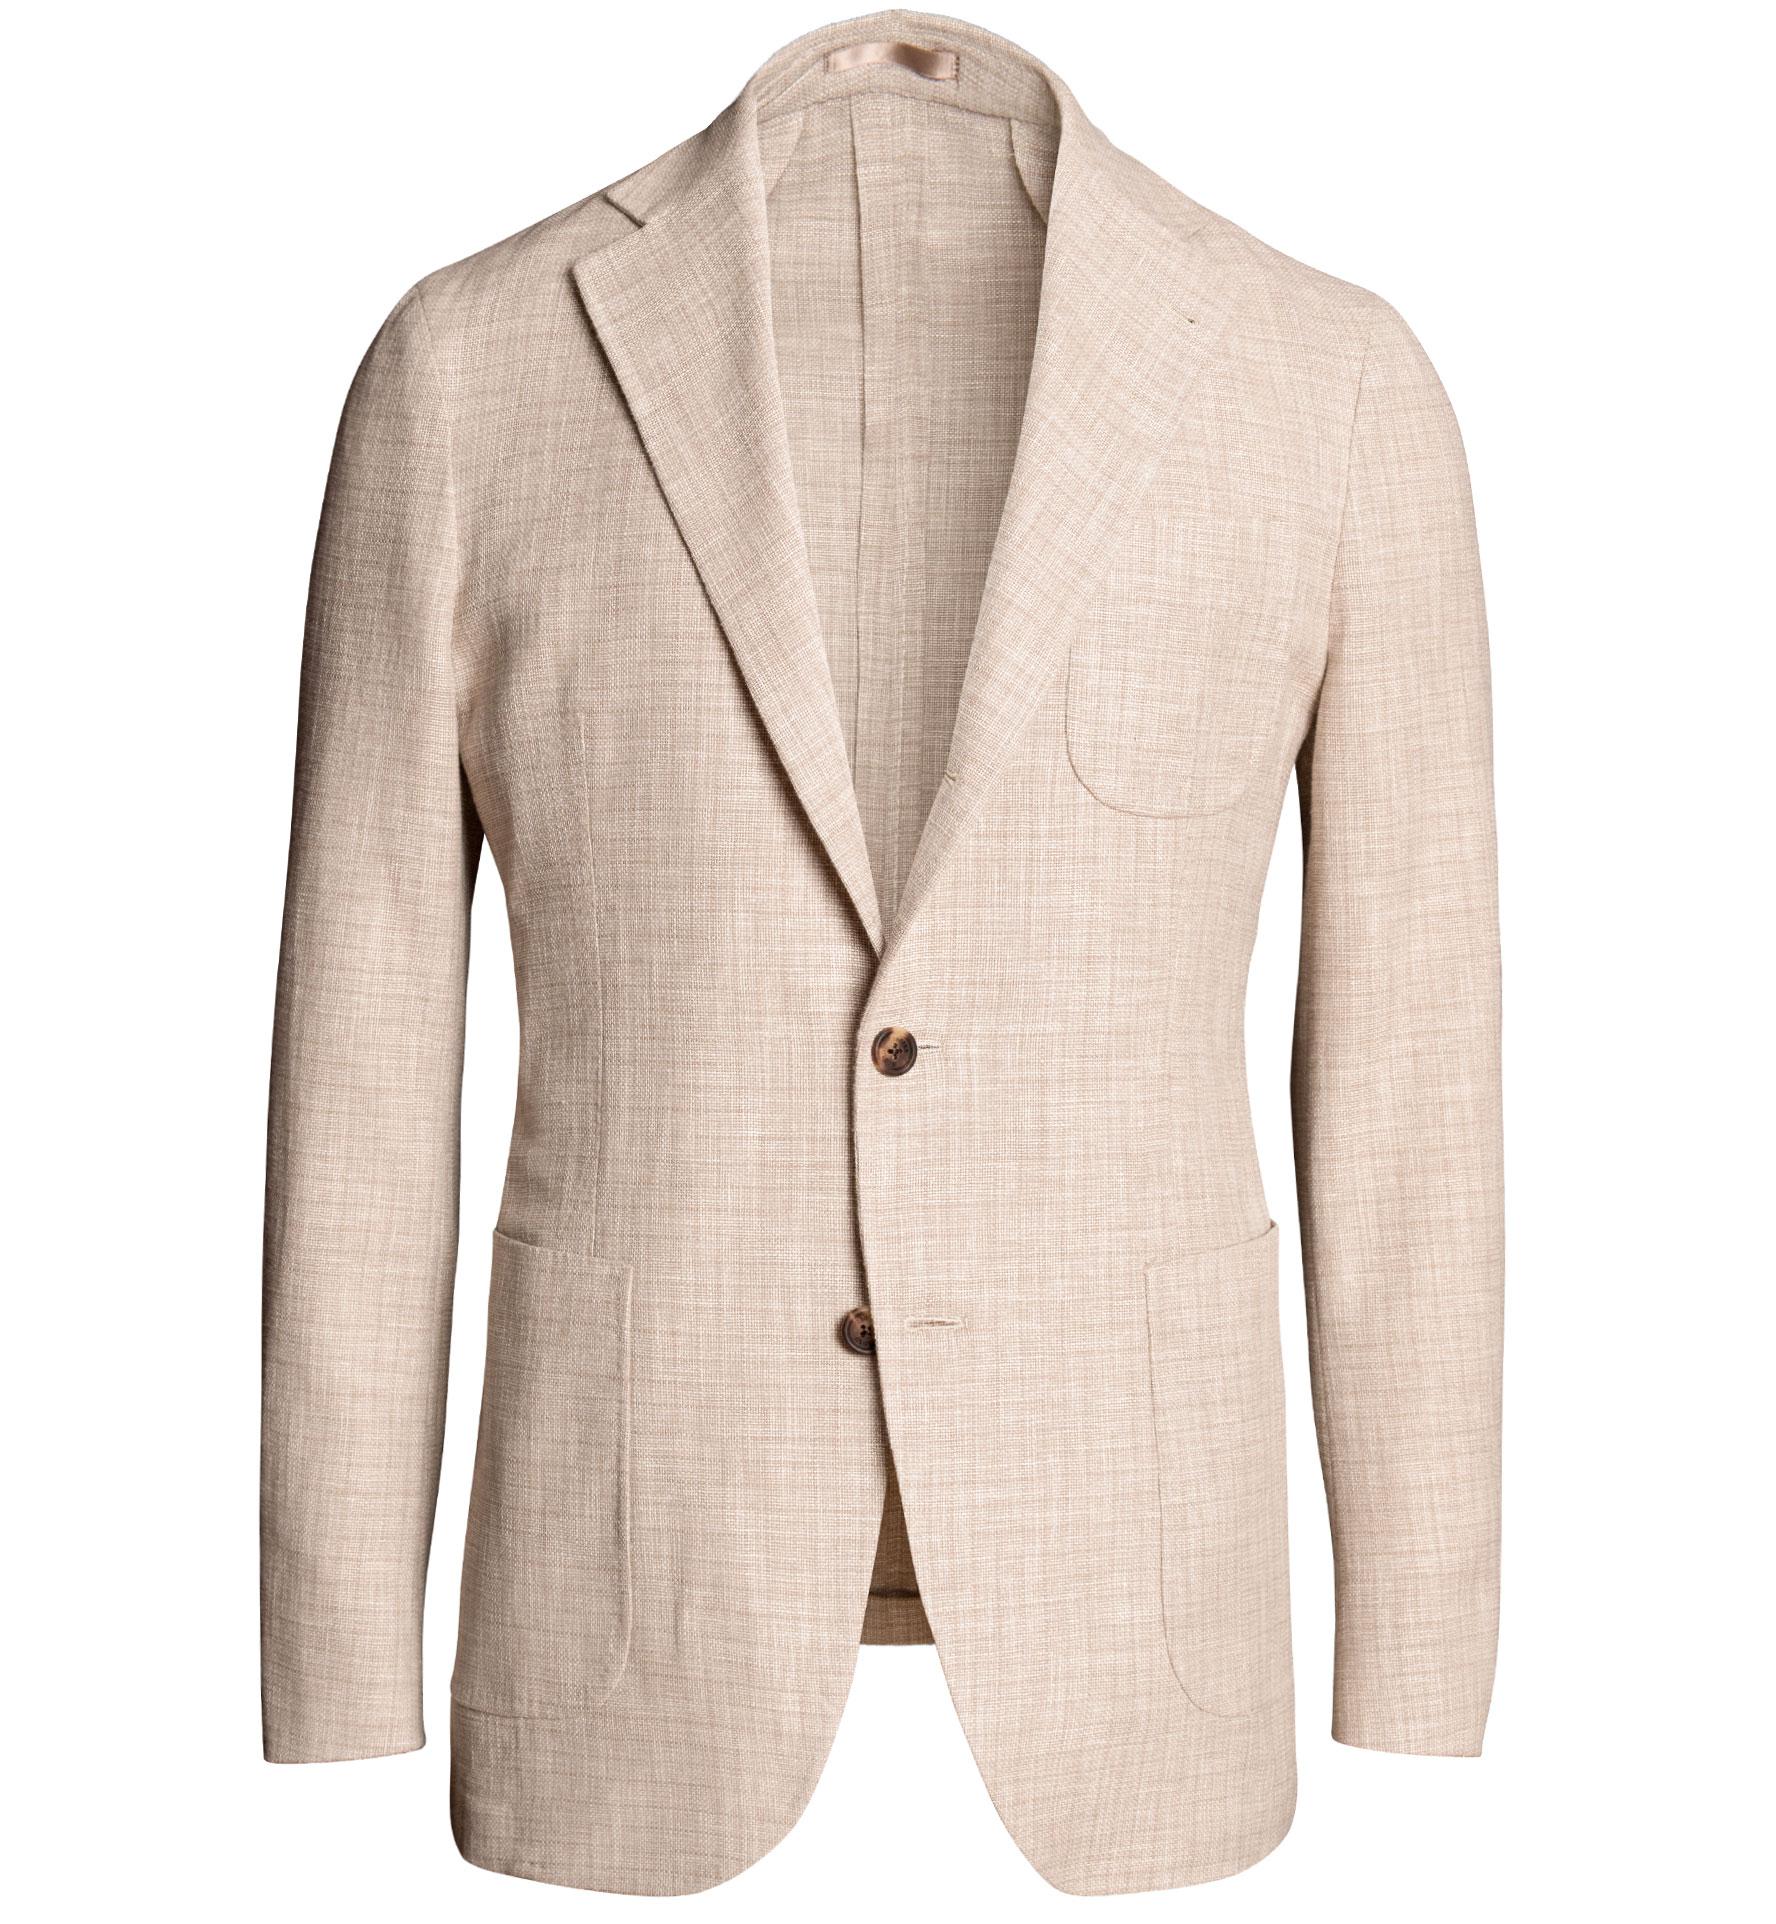 Zoom Image of Waverly Beige Wool Blend Gauze Weave Jacket